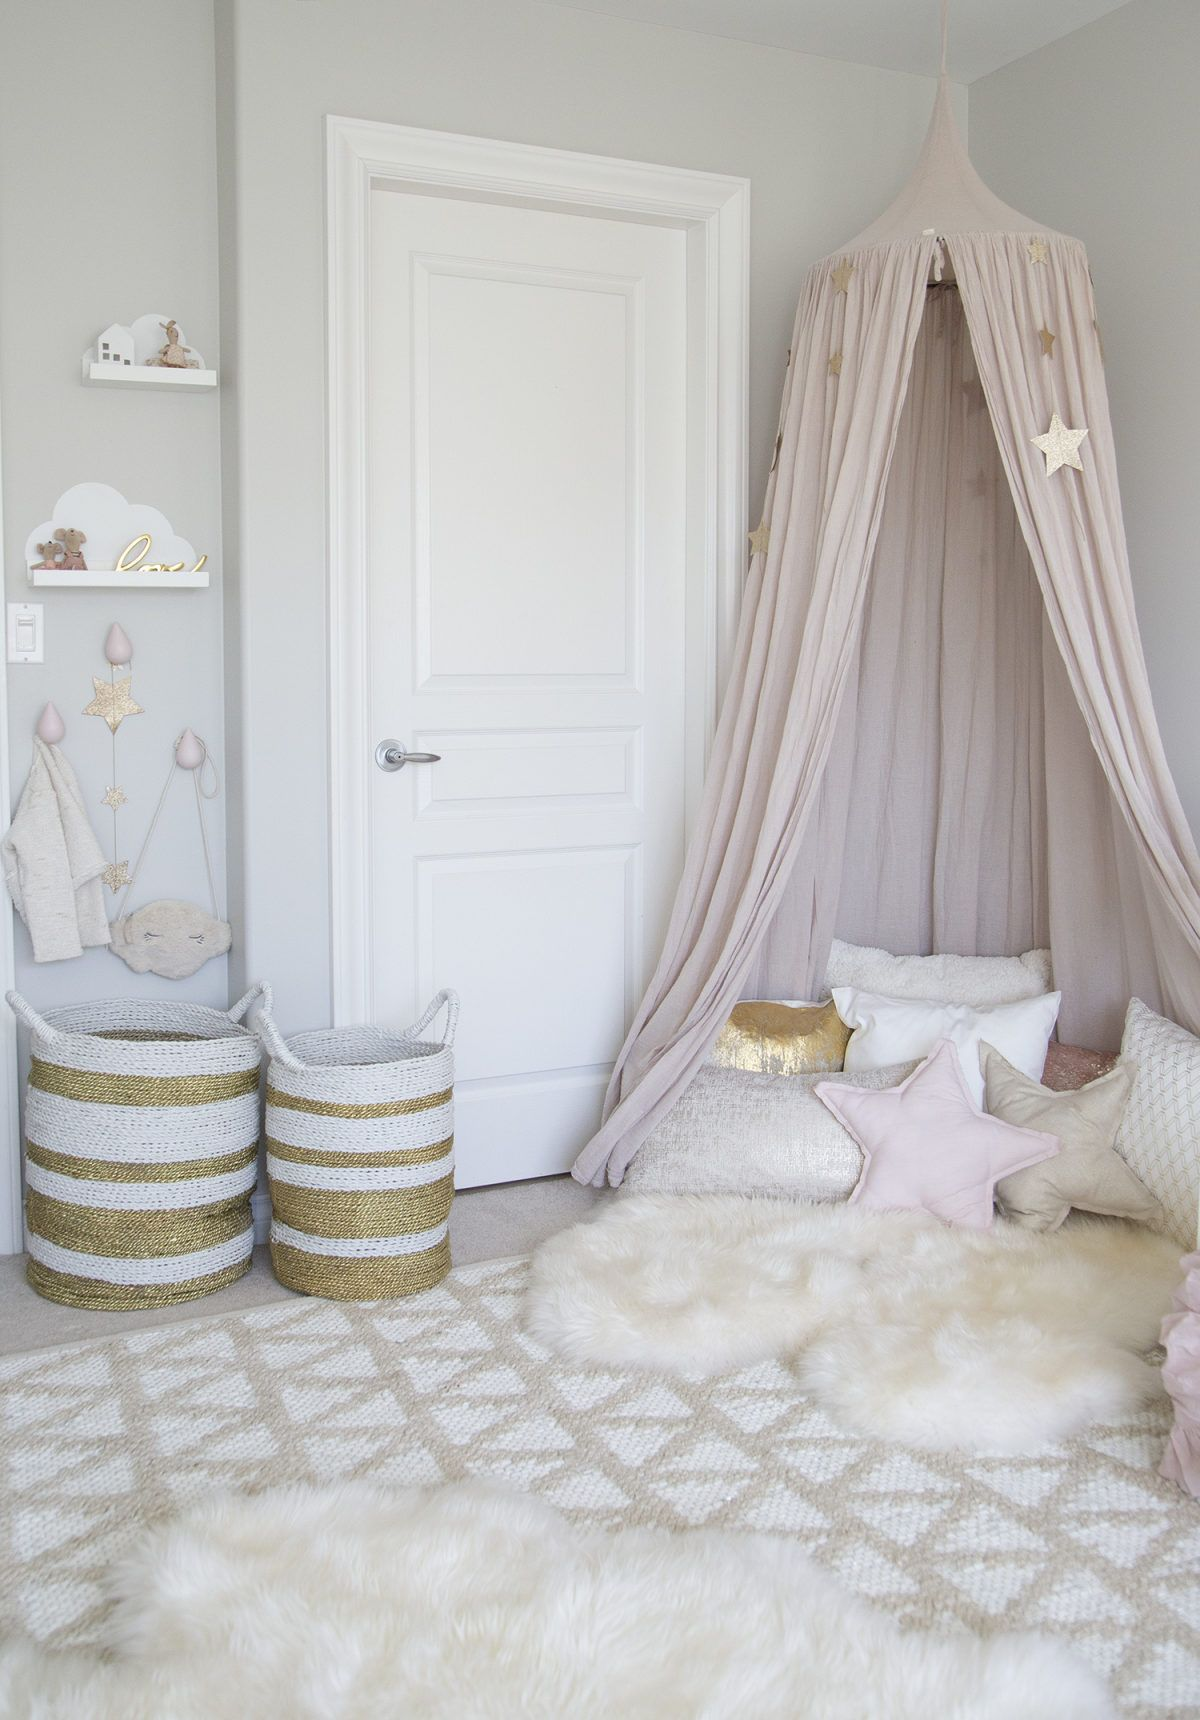 Pantone's Rose Quartz Makes for the Prettiest Little Girl's Room #toddlerrooms